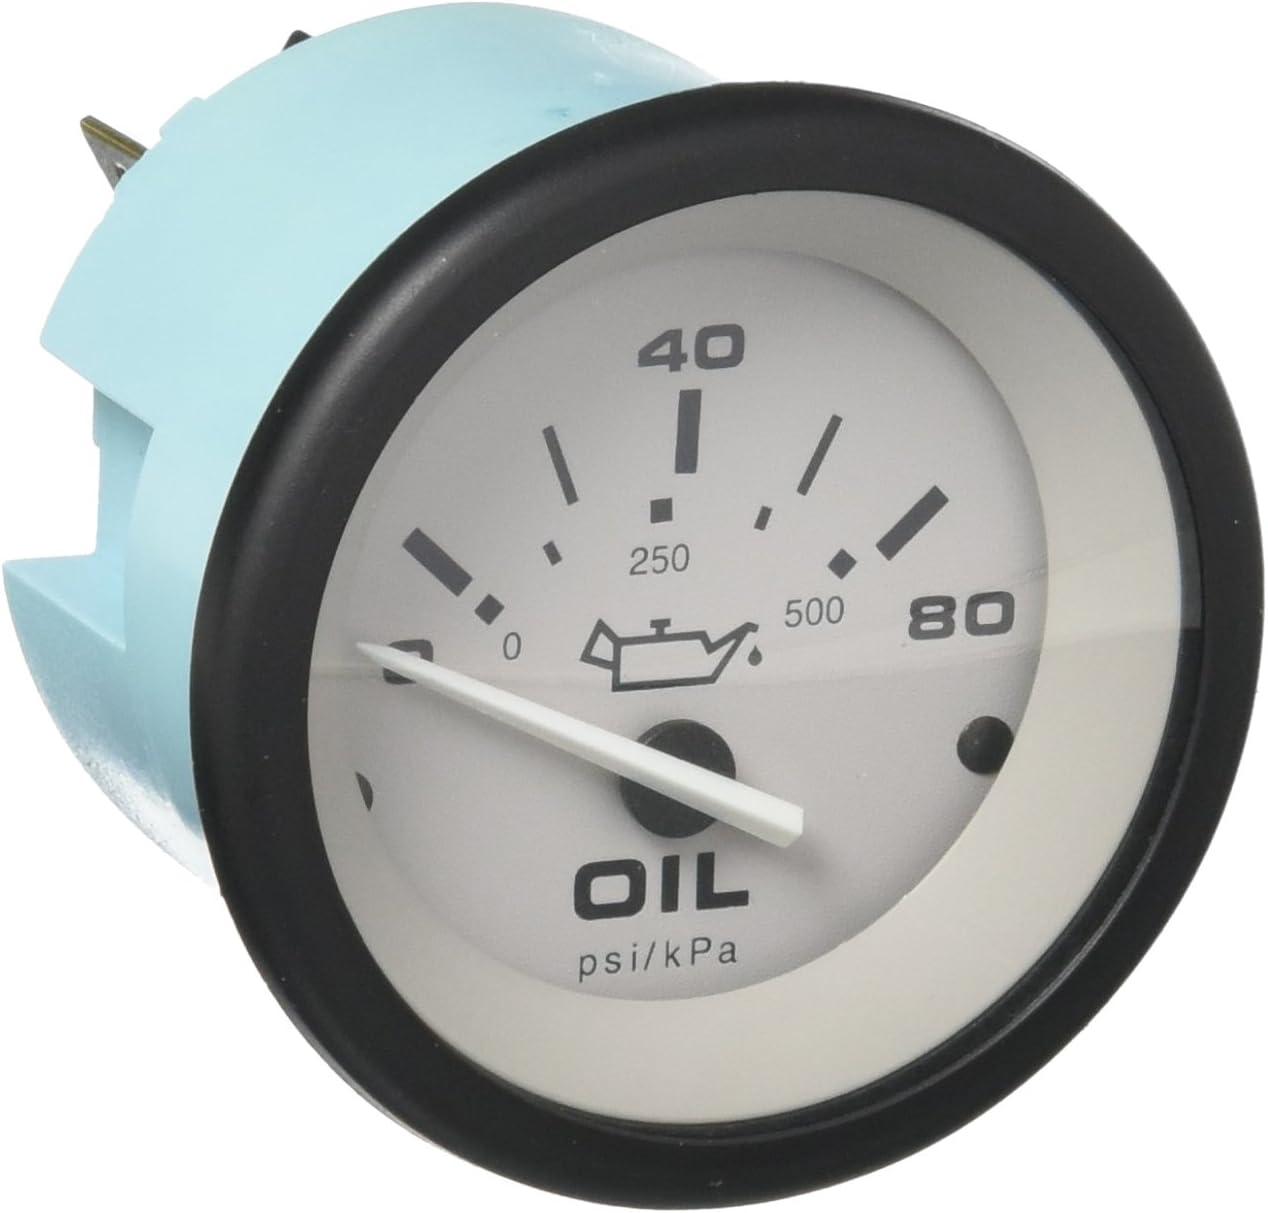 2 Sierra International 61550P Driftwood 0 to 80 Psi Dial Range Scratch Resistant Electric Oil Pressure Gauge